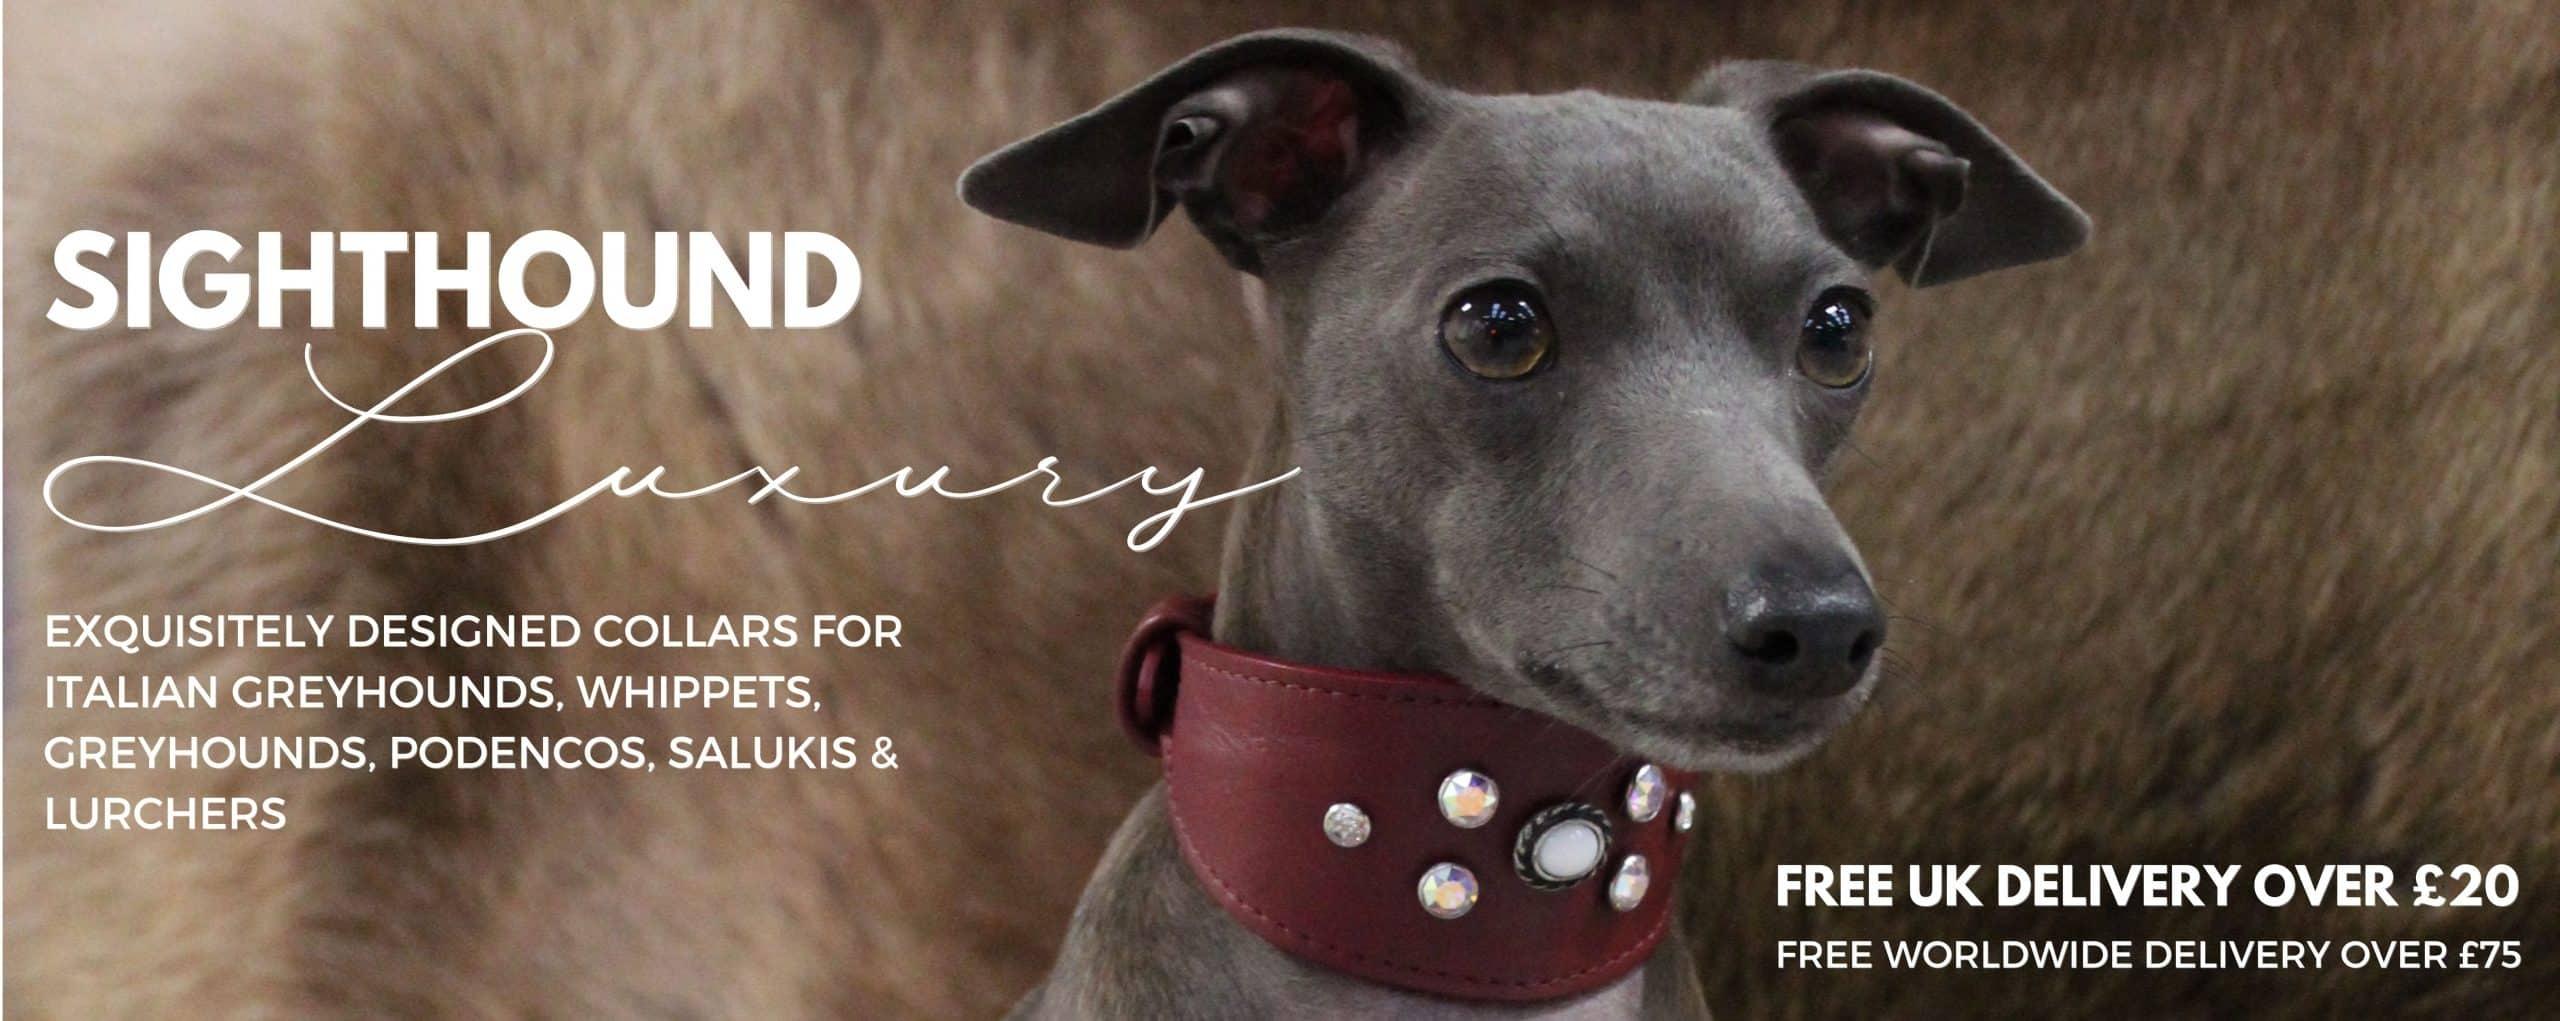 Greyhound Dog Collar Home Page Banner